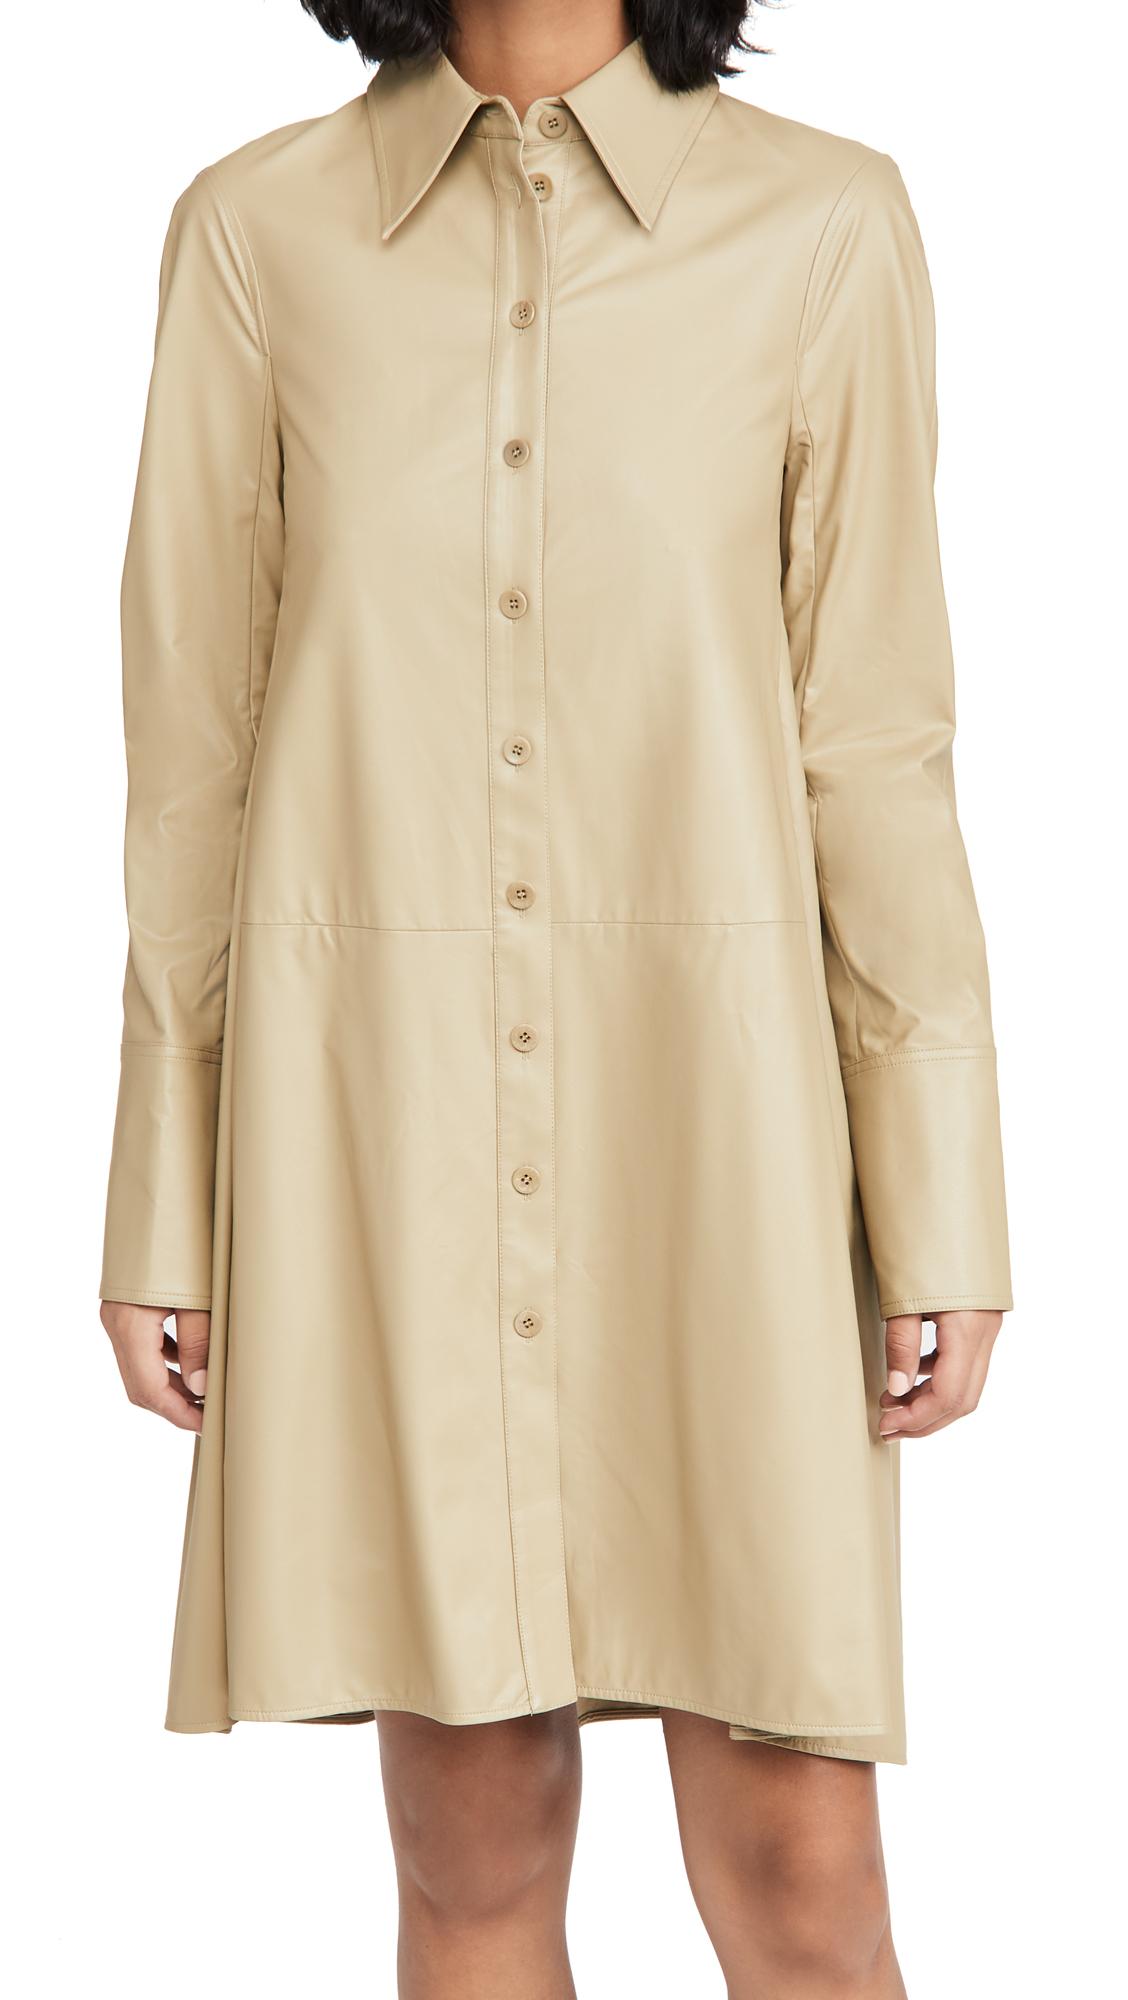 Tibi Faux Leather Shirtdress